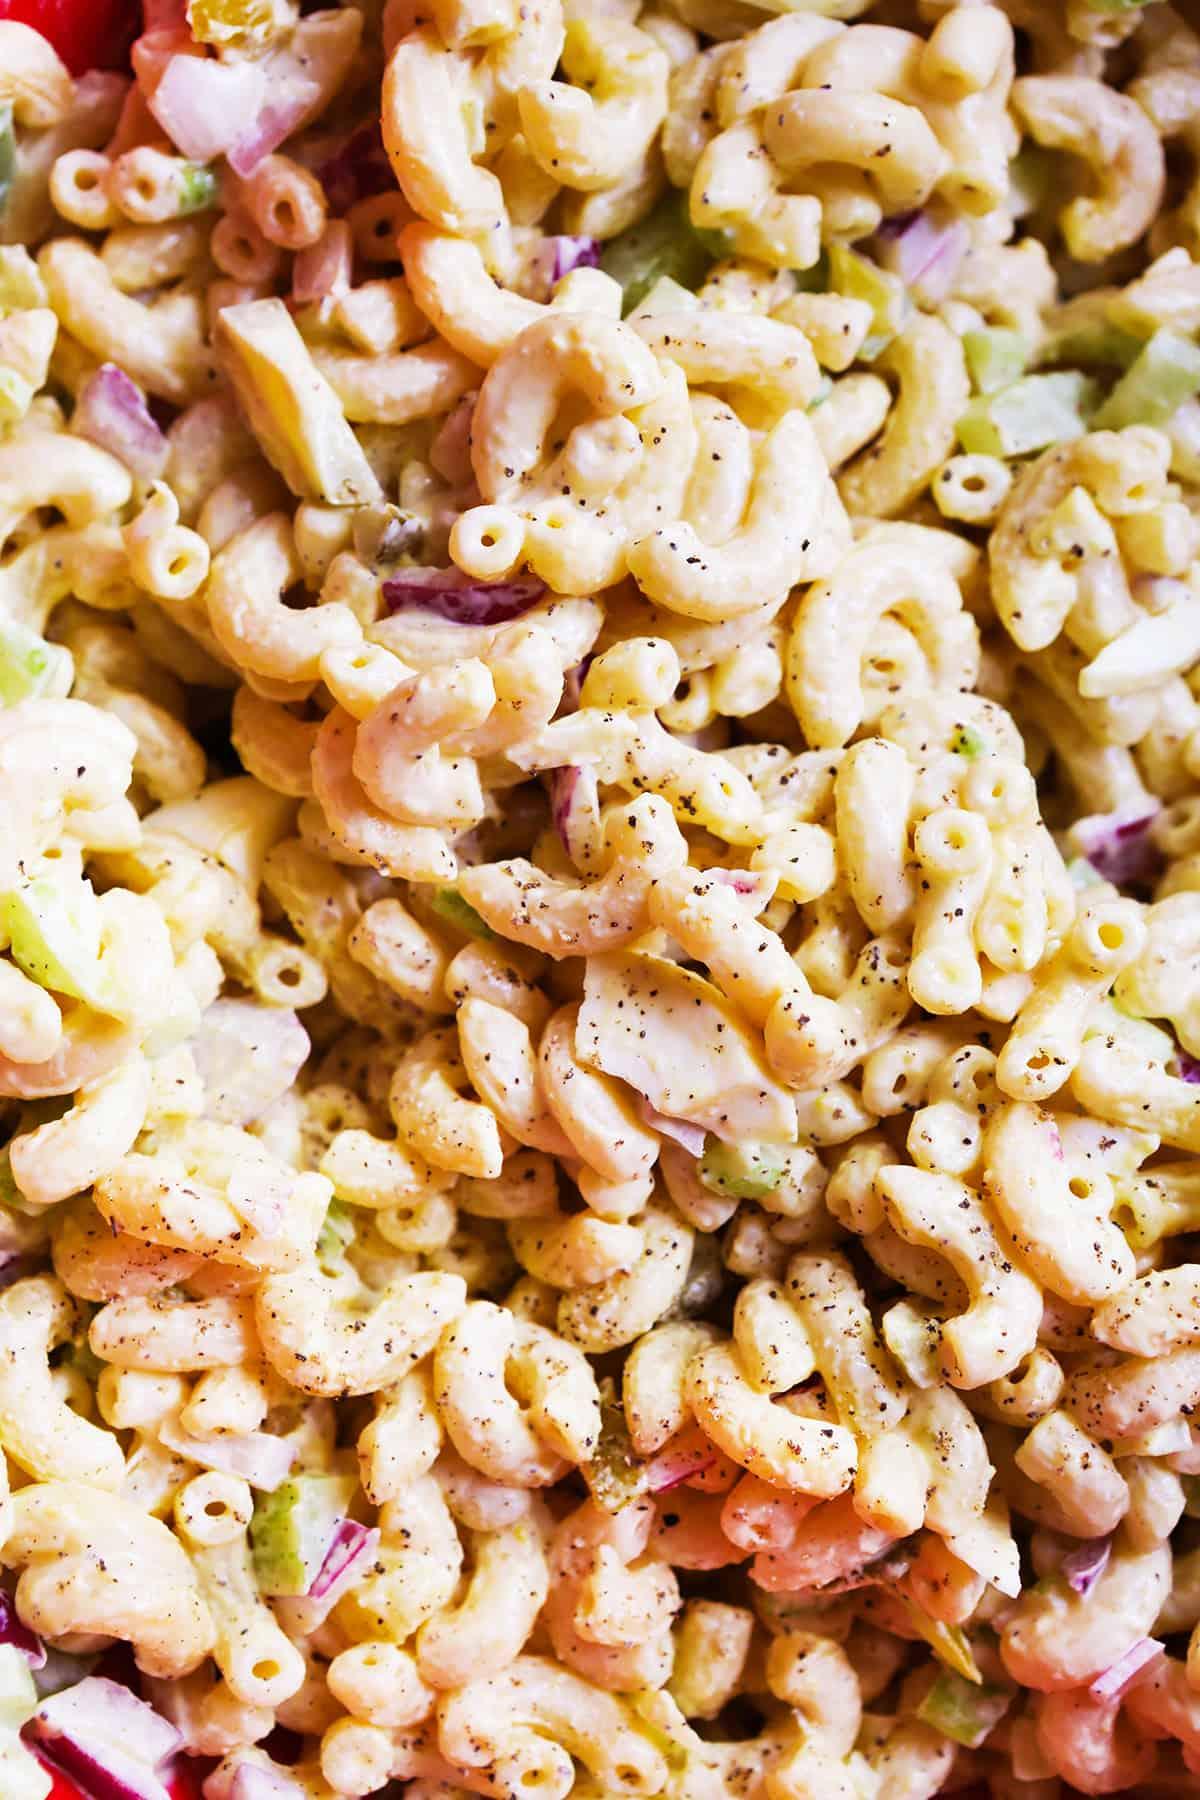 Super close up of macaroni salad in mixing bowl.